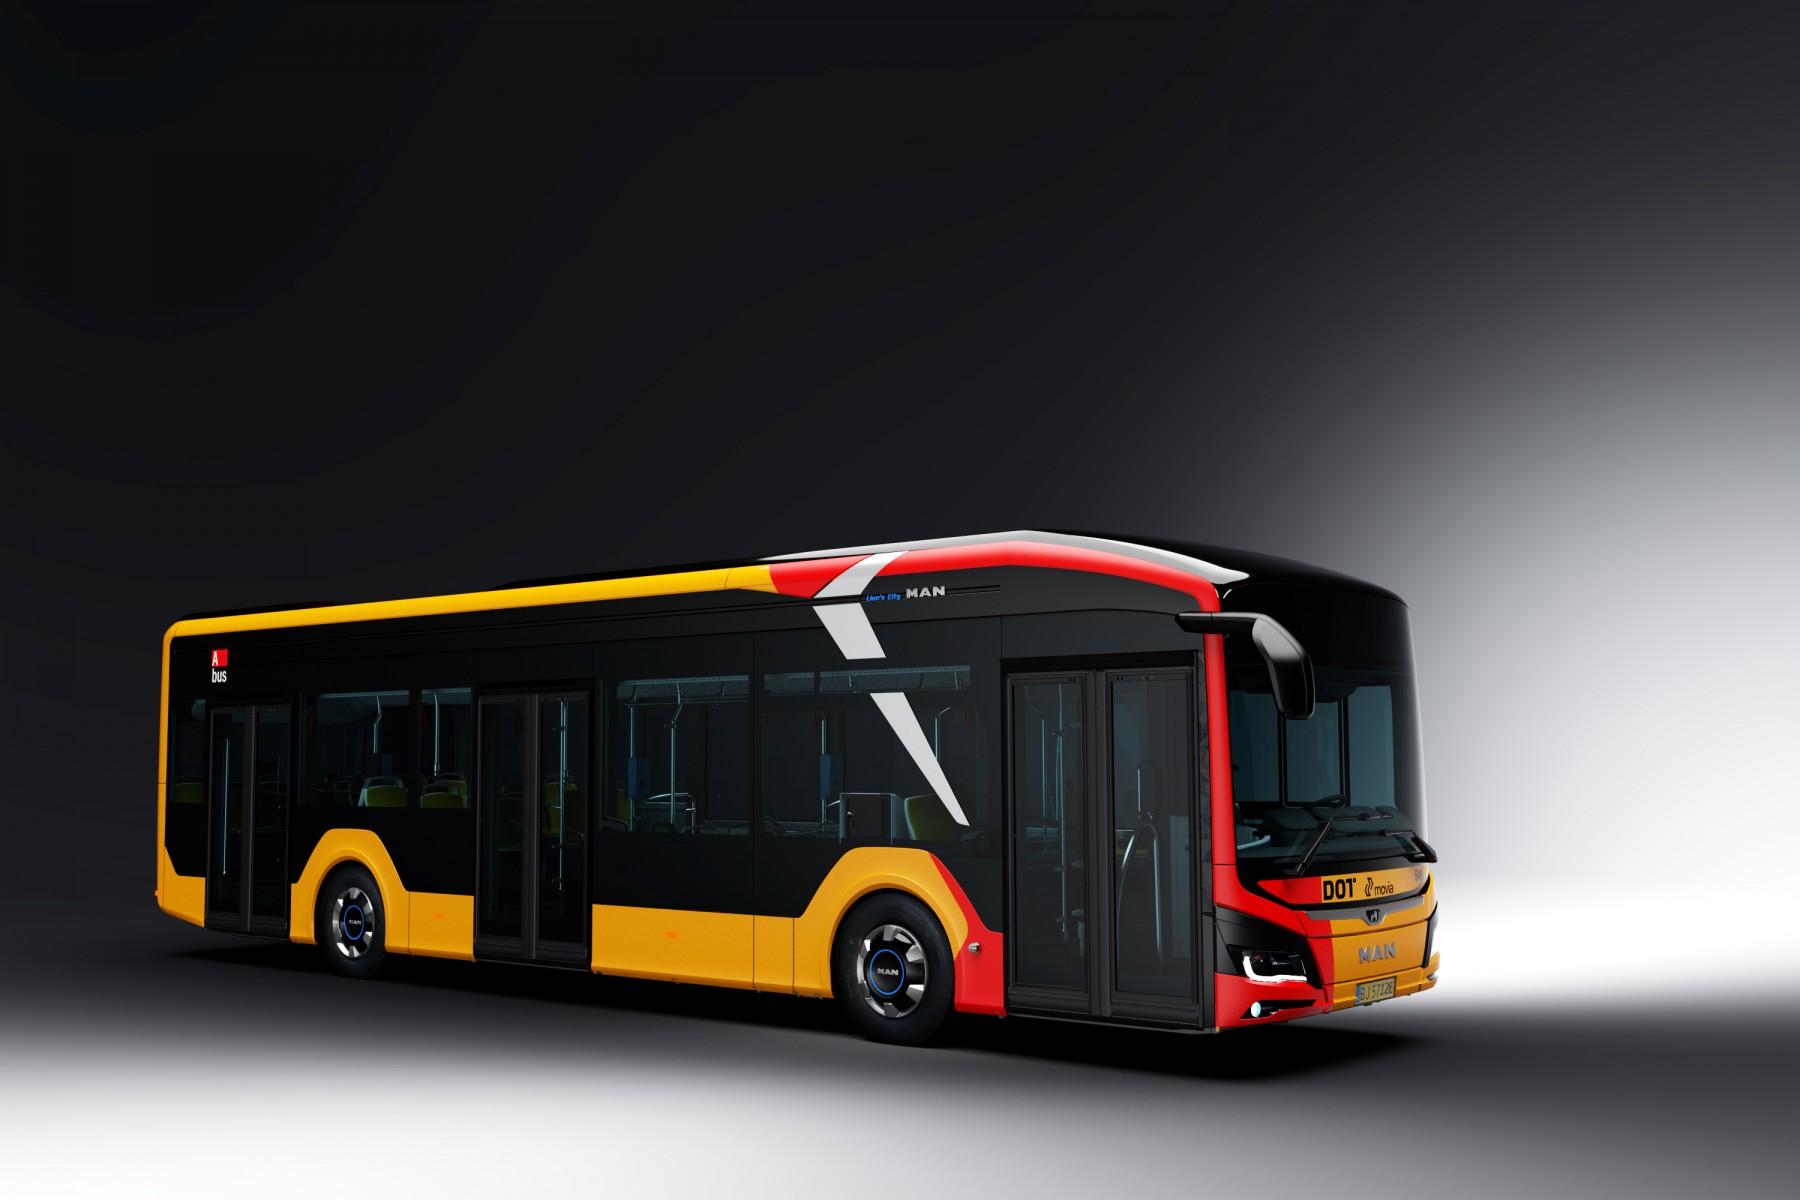 MAN electric bus Copenhagen